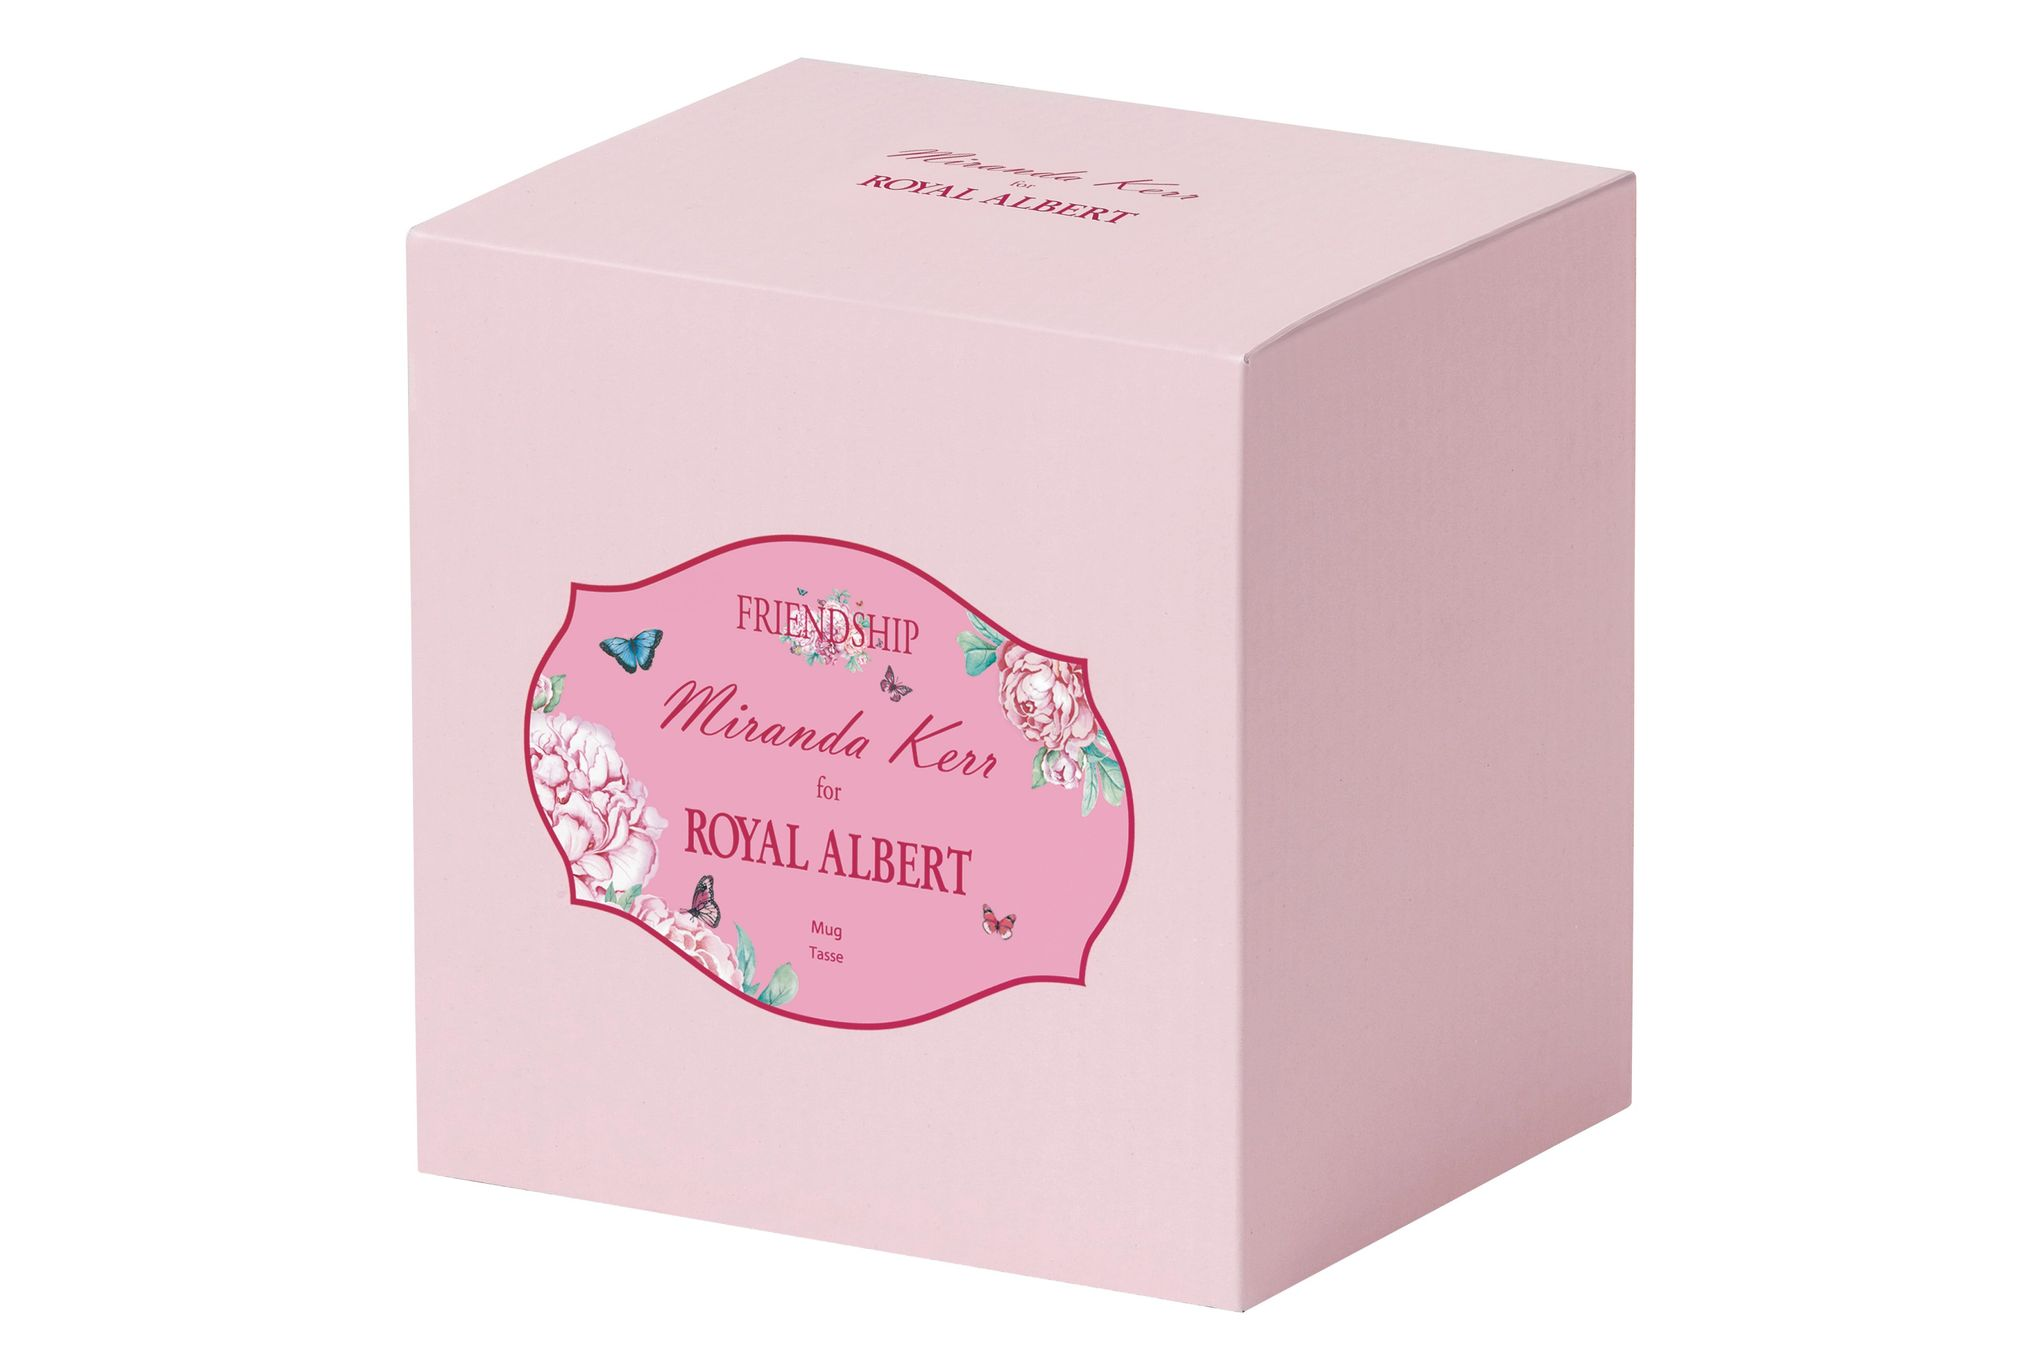 Miranda Kerr for Royal Albert Friendship Mug Pink 0.4l thumb 2